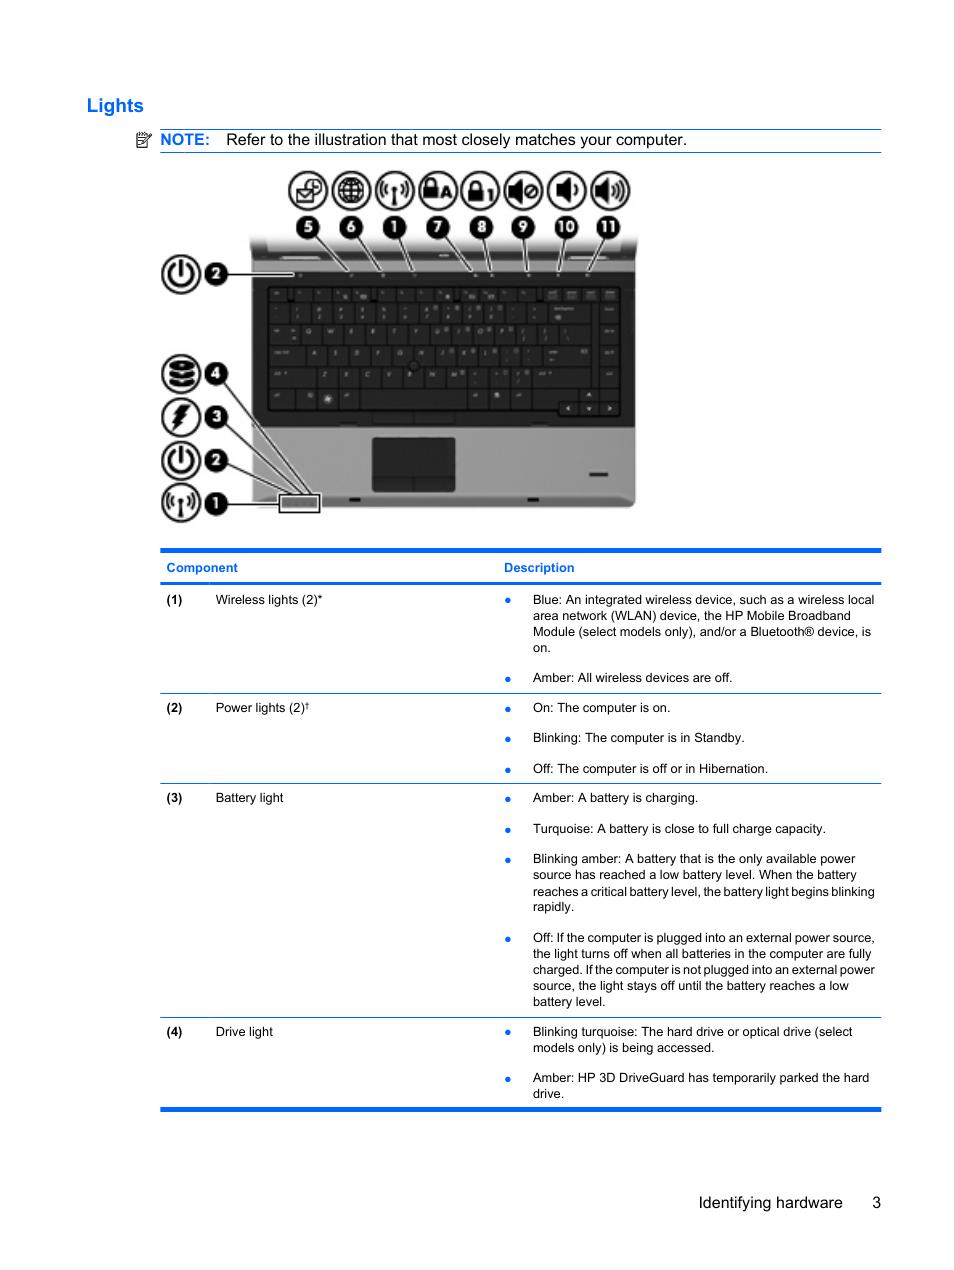 Lights, Identifying hardware 3   HP ProBook 6445b Notebook-PC User